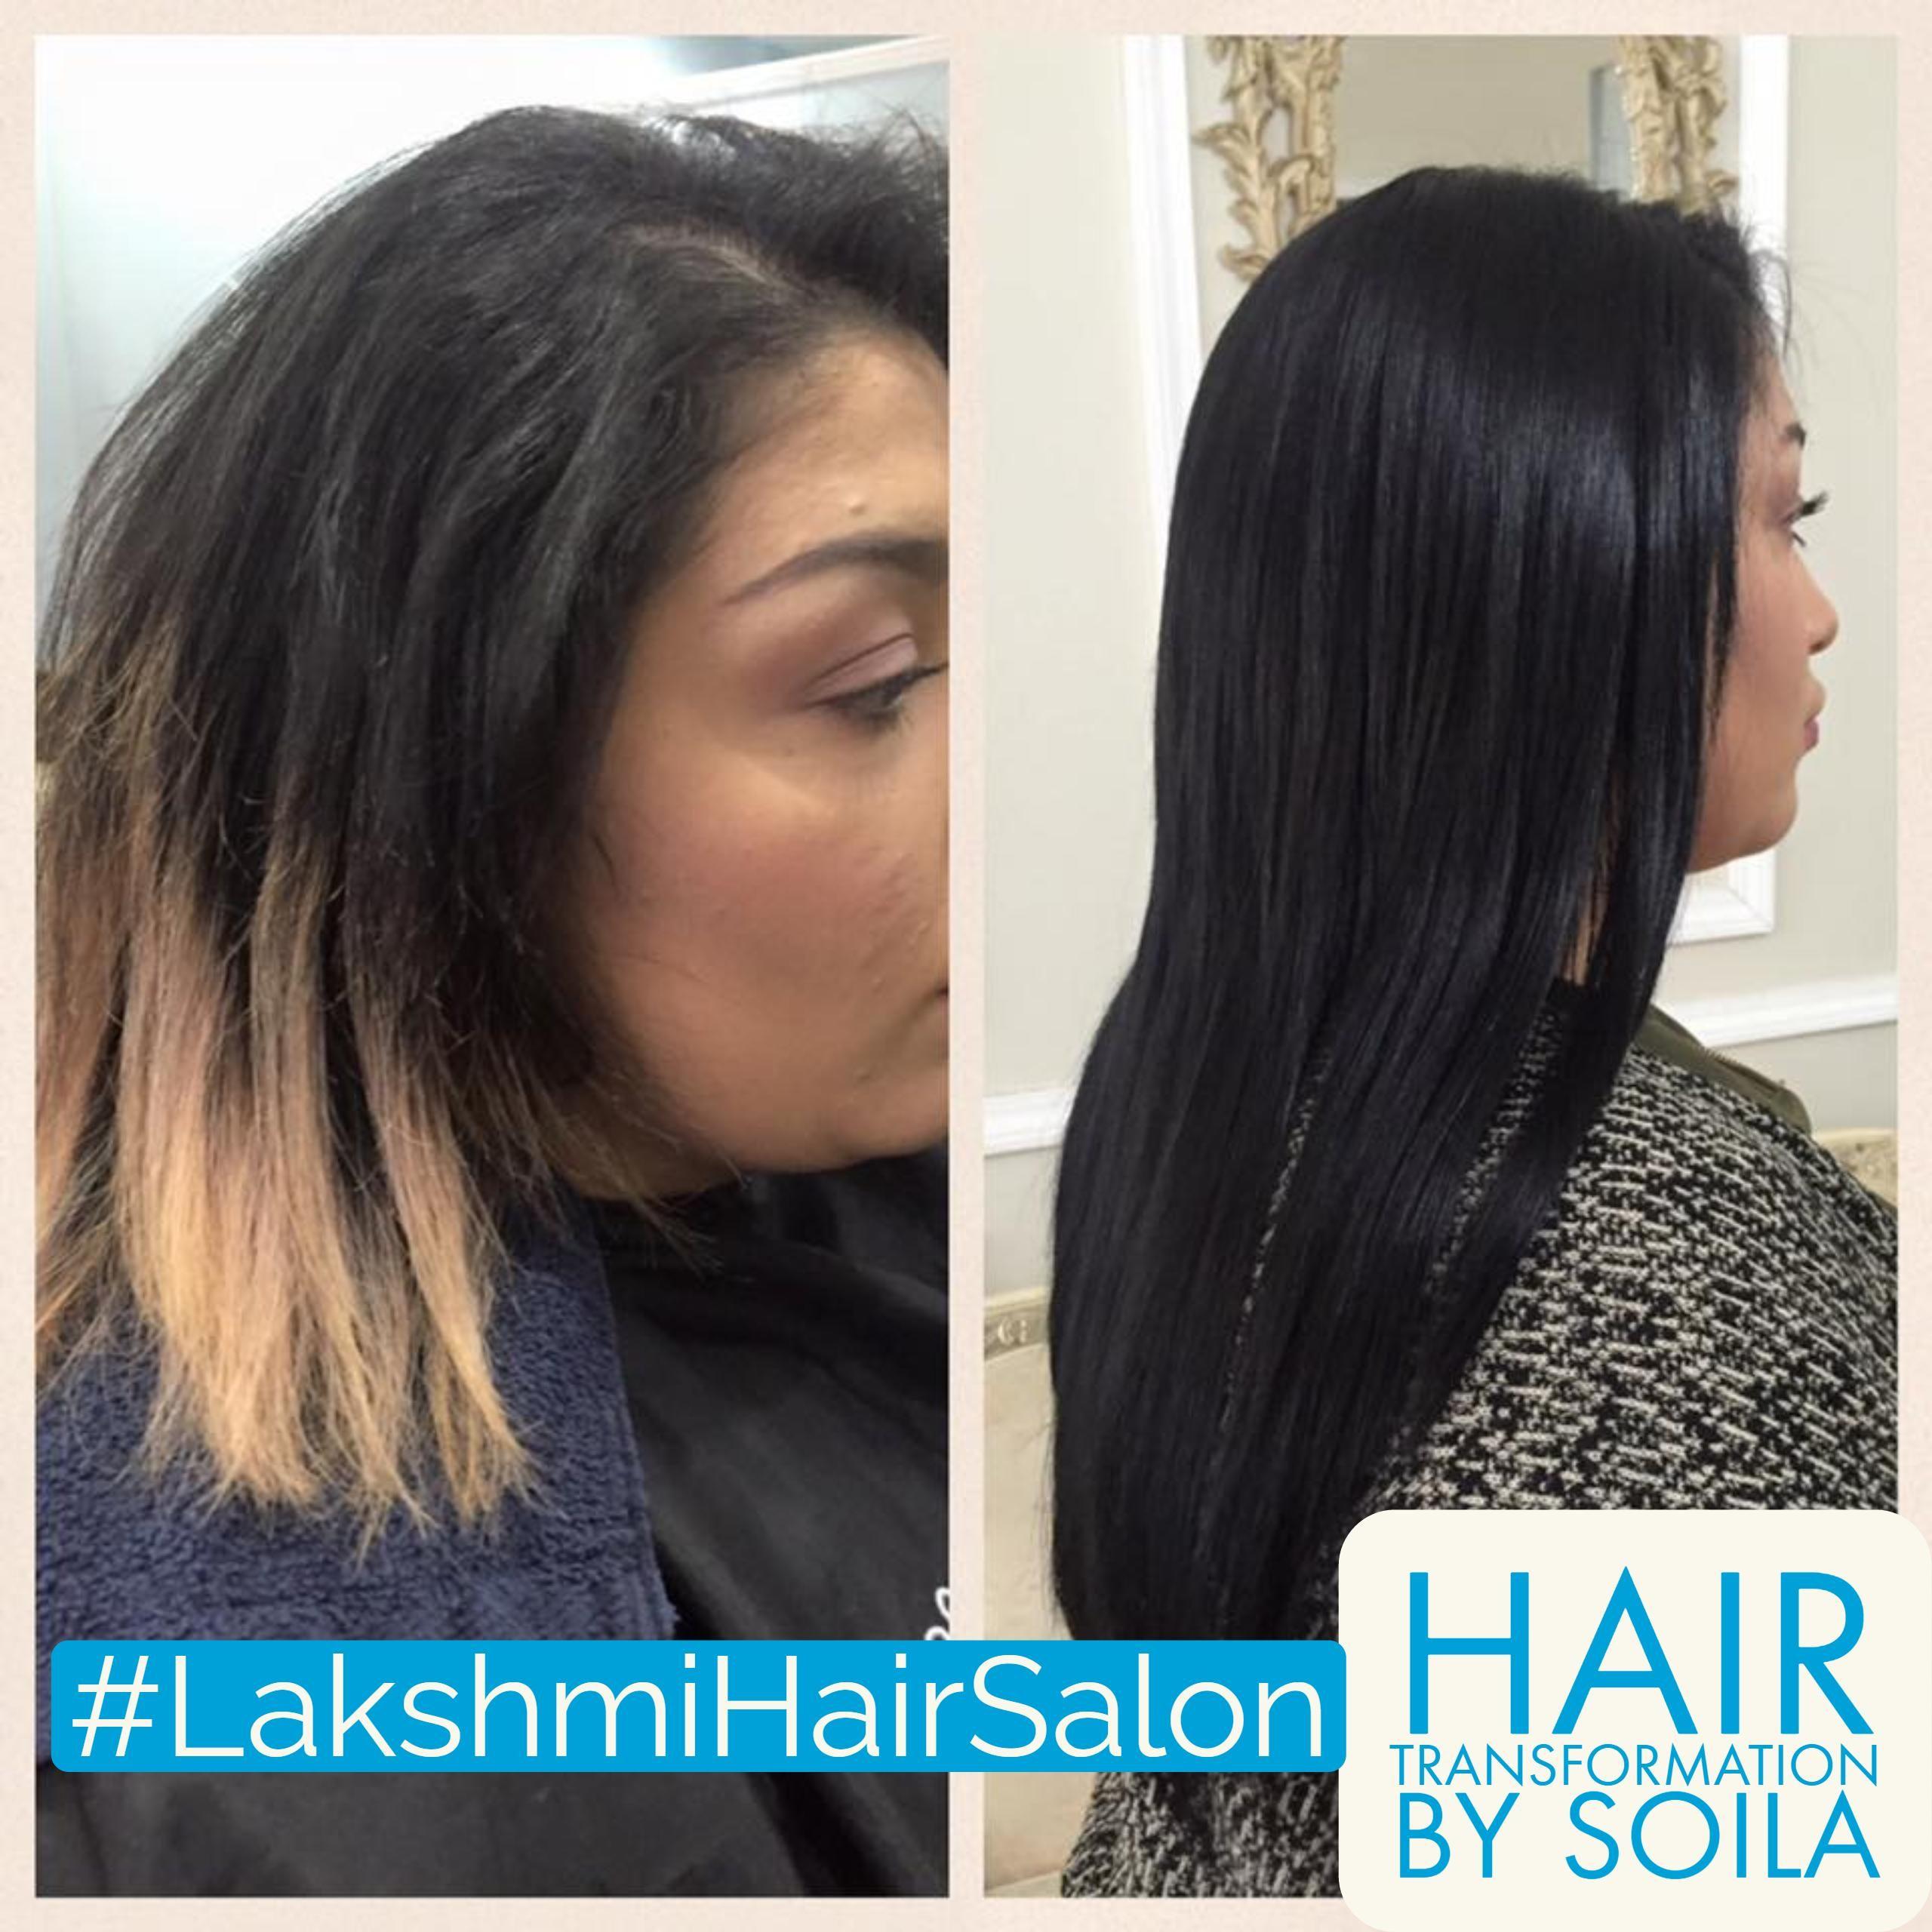 Hair Extensions By Soila At Lakshmi Hair Salon Artist Styling